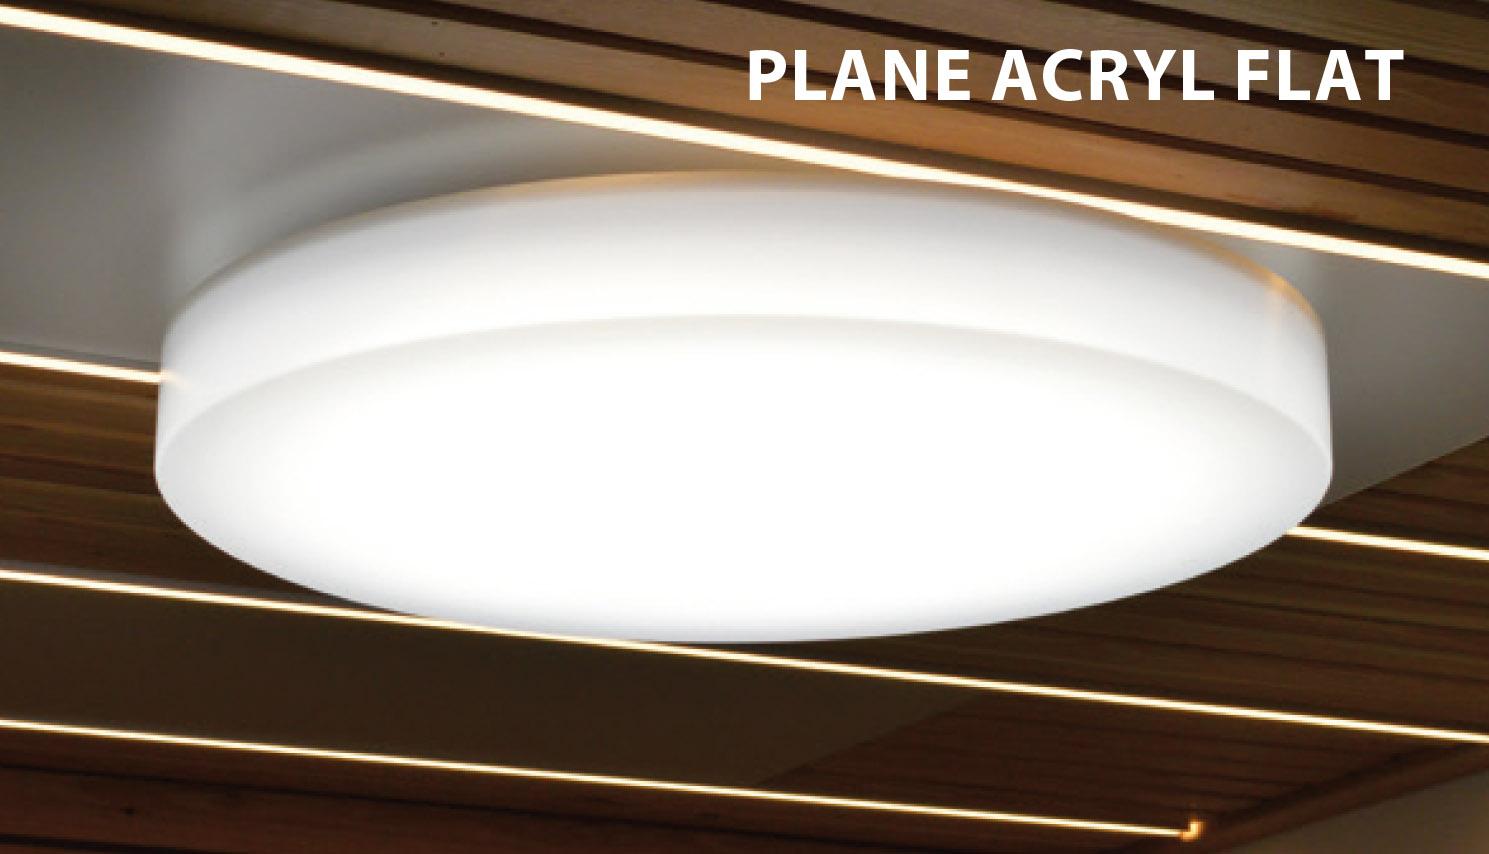 Plane Acryl Flat